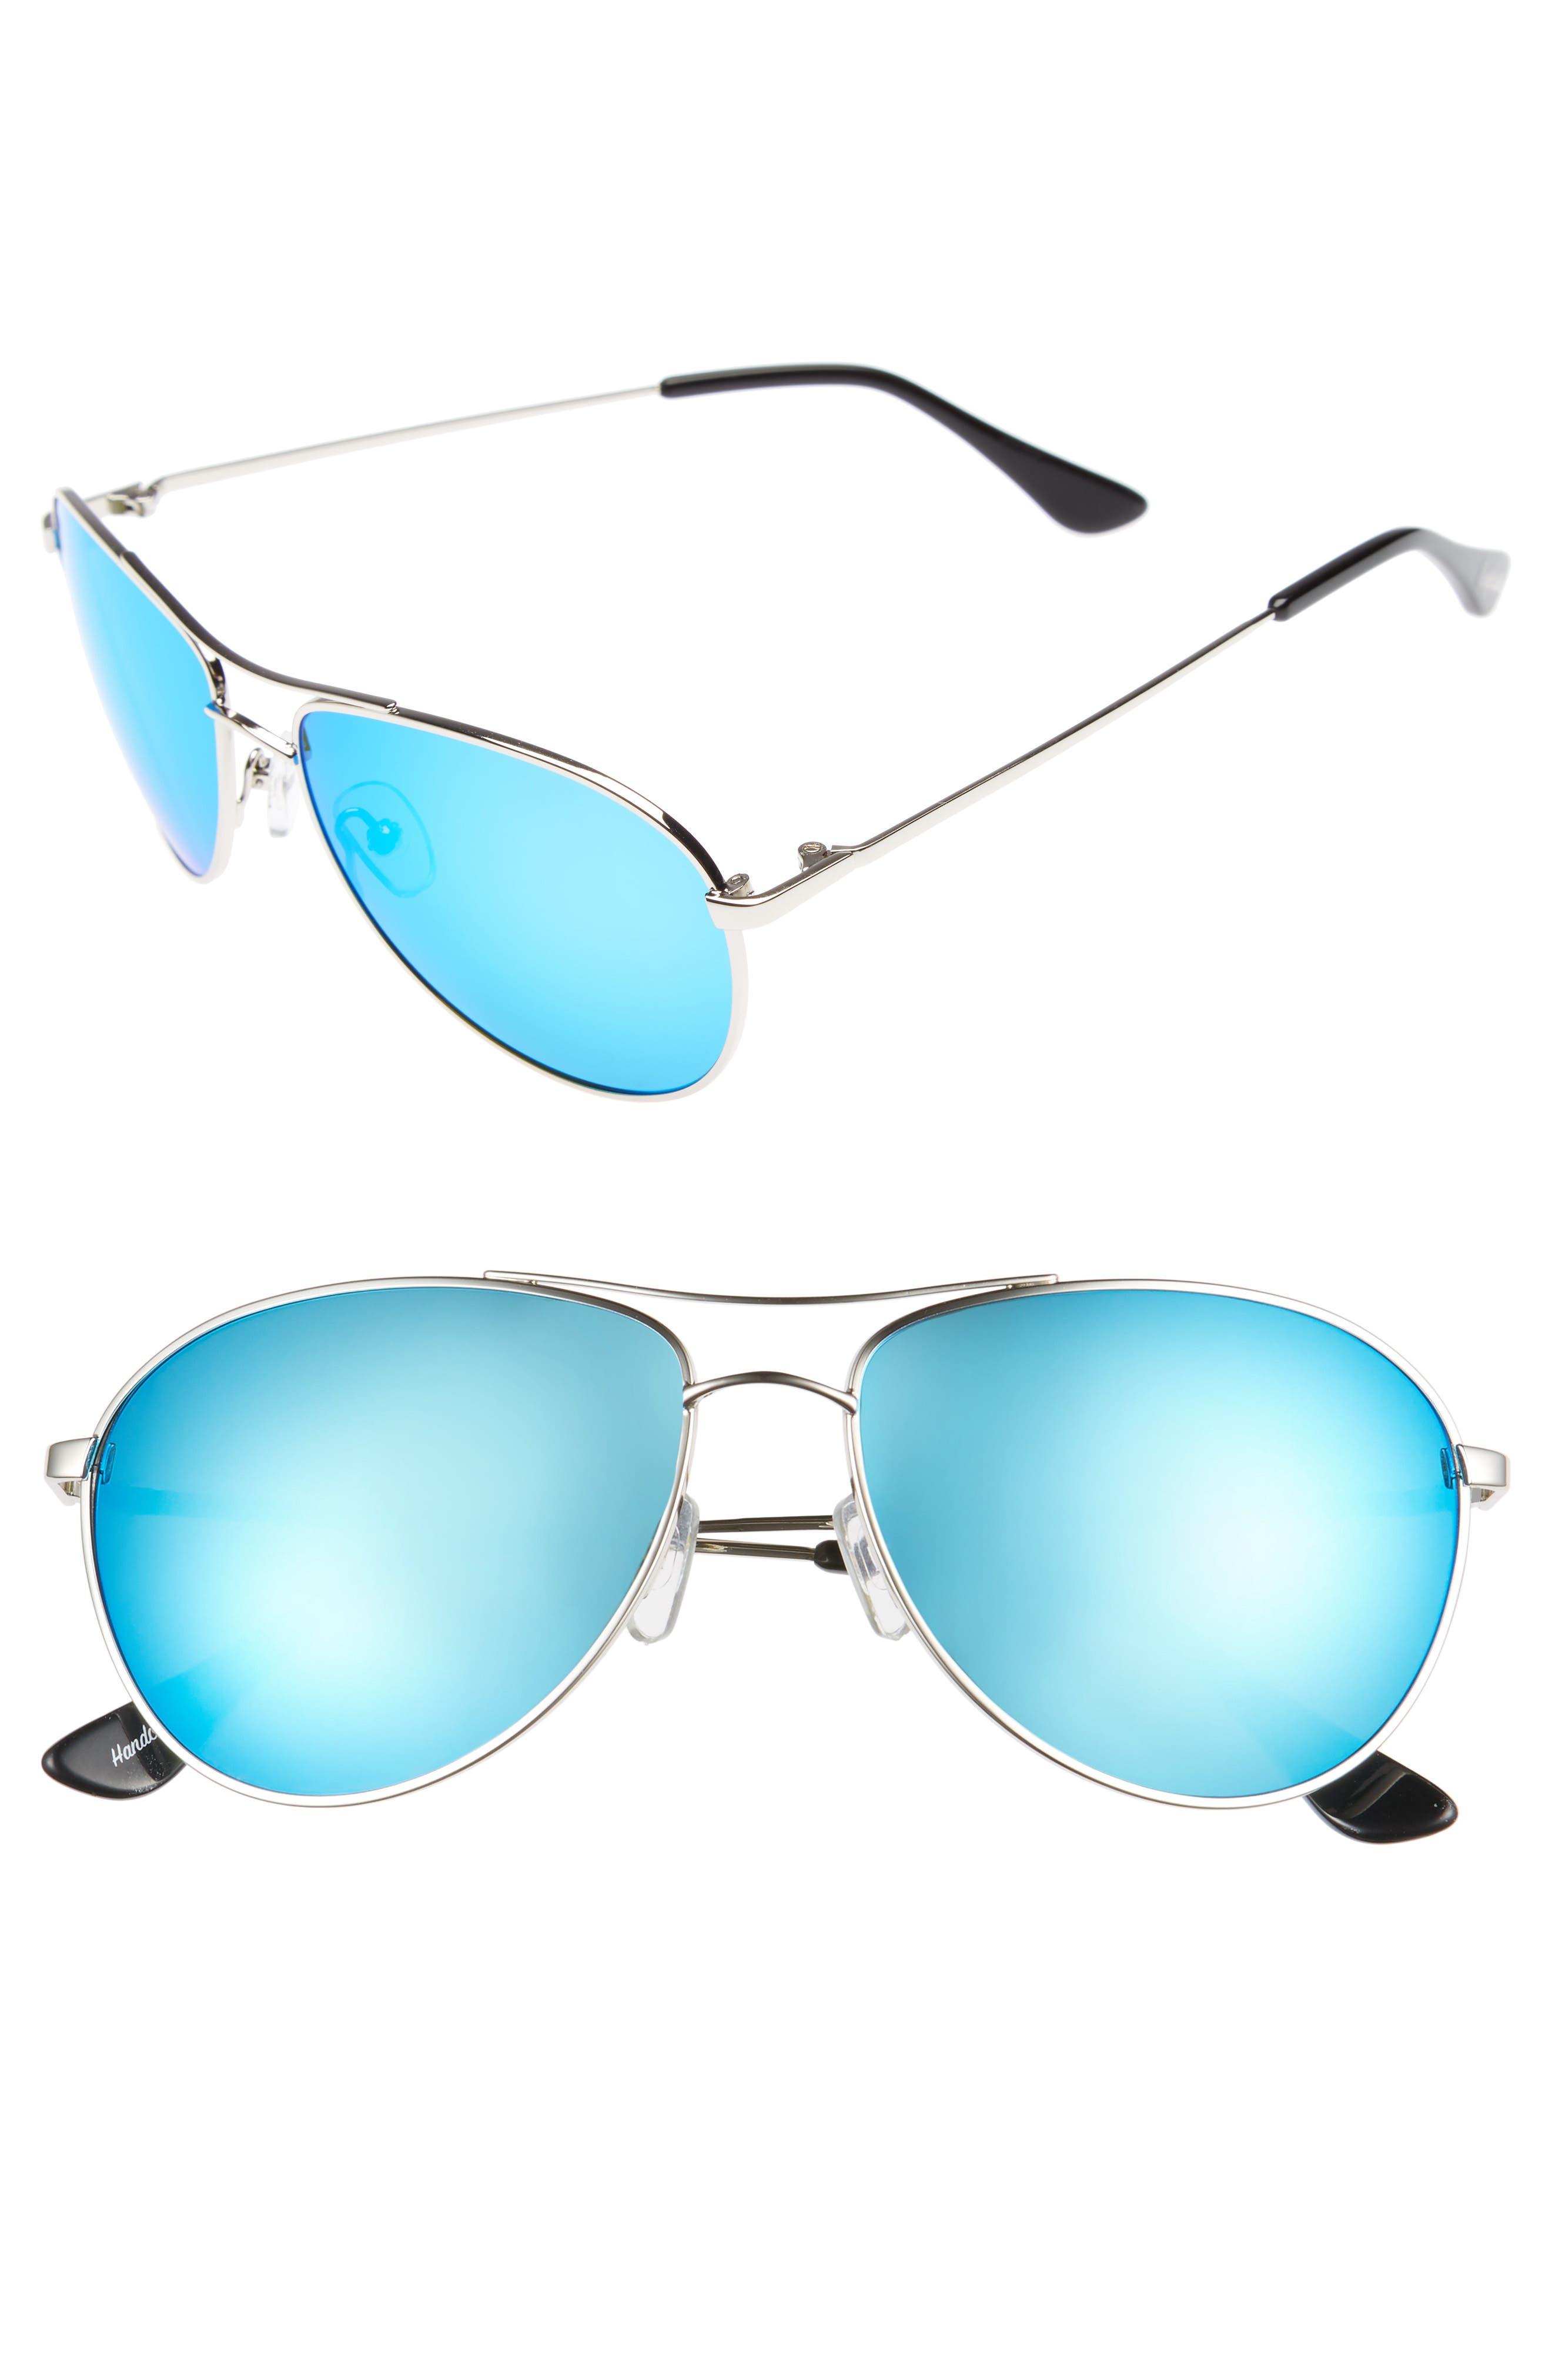 Alternate Image 1 Selected - Brightside Orville 58mm Mirrored Aviator Sunglasses